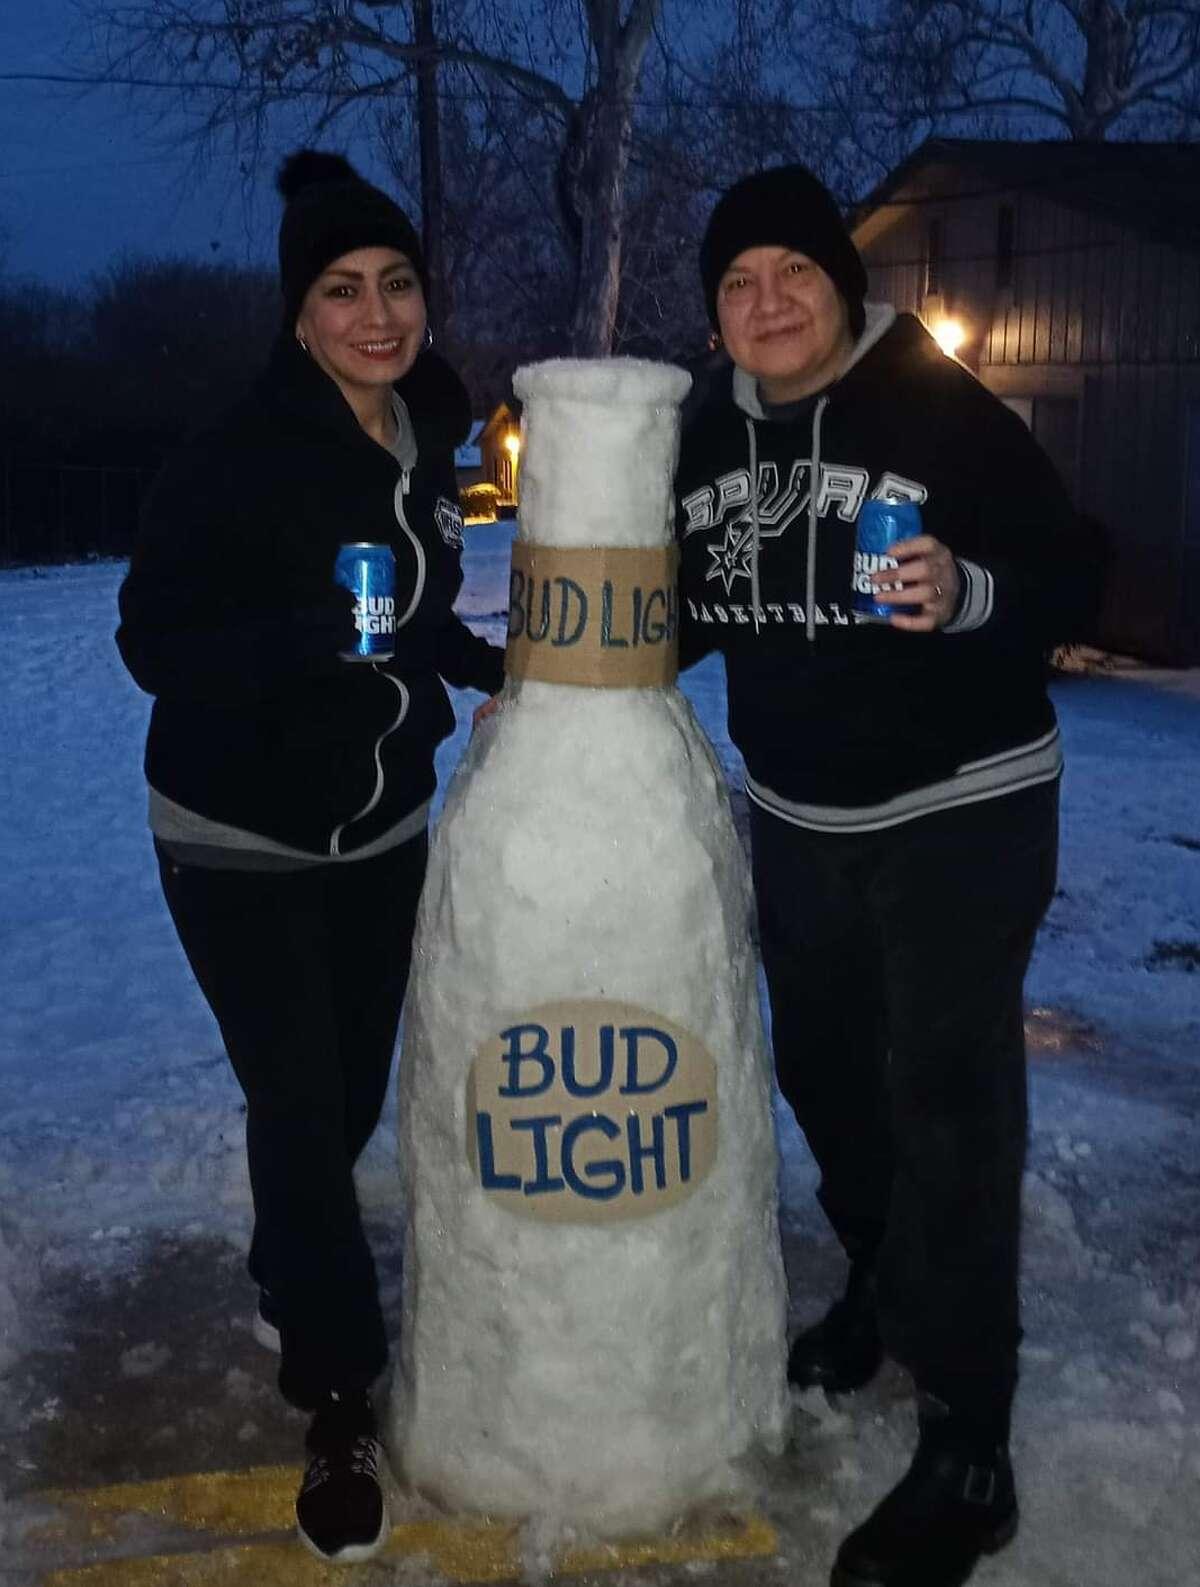 April Perez spent about an hour and a half building her giant Bud Light bottle, her niece Rosa Sanchez told MySA.com.